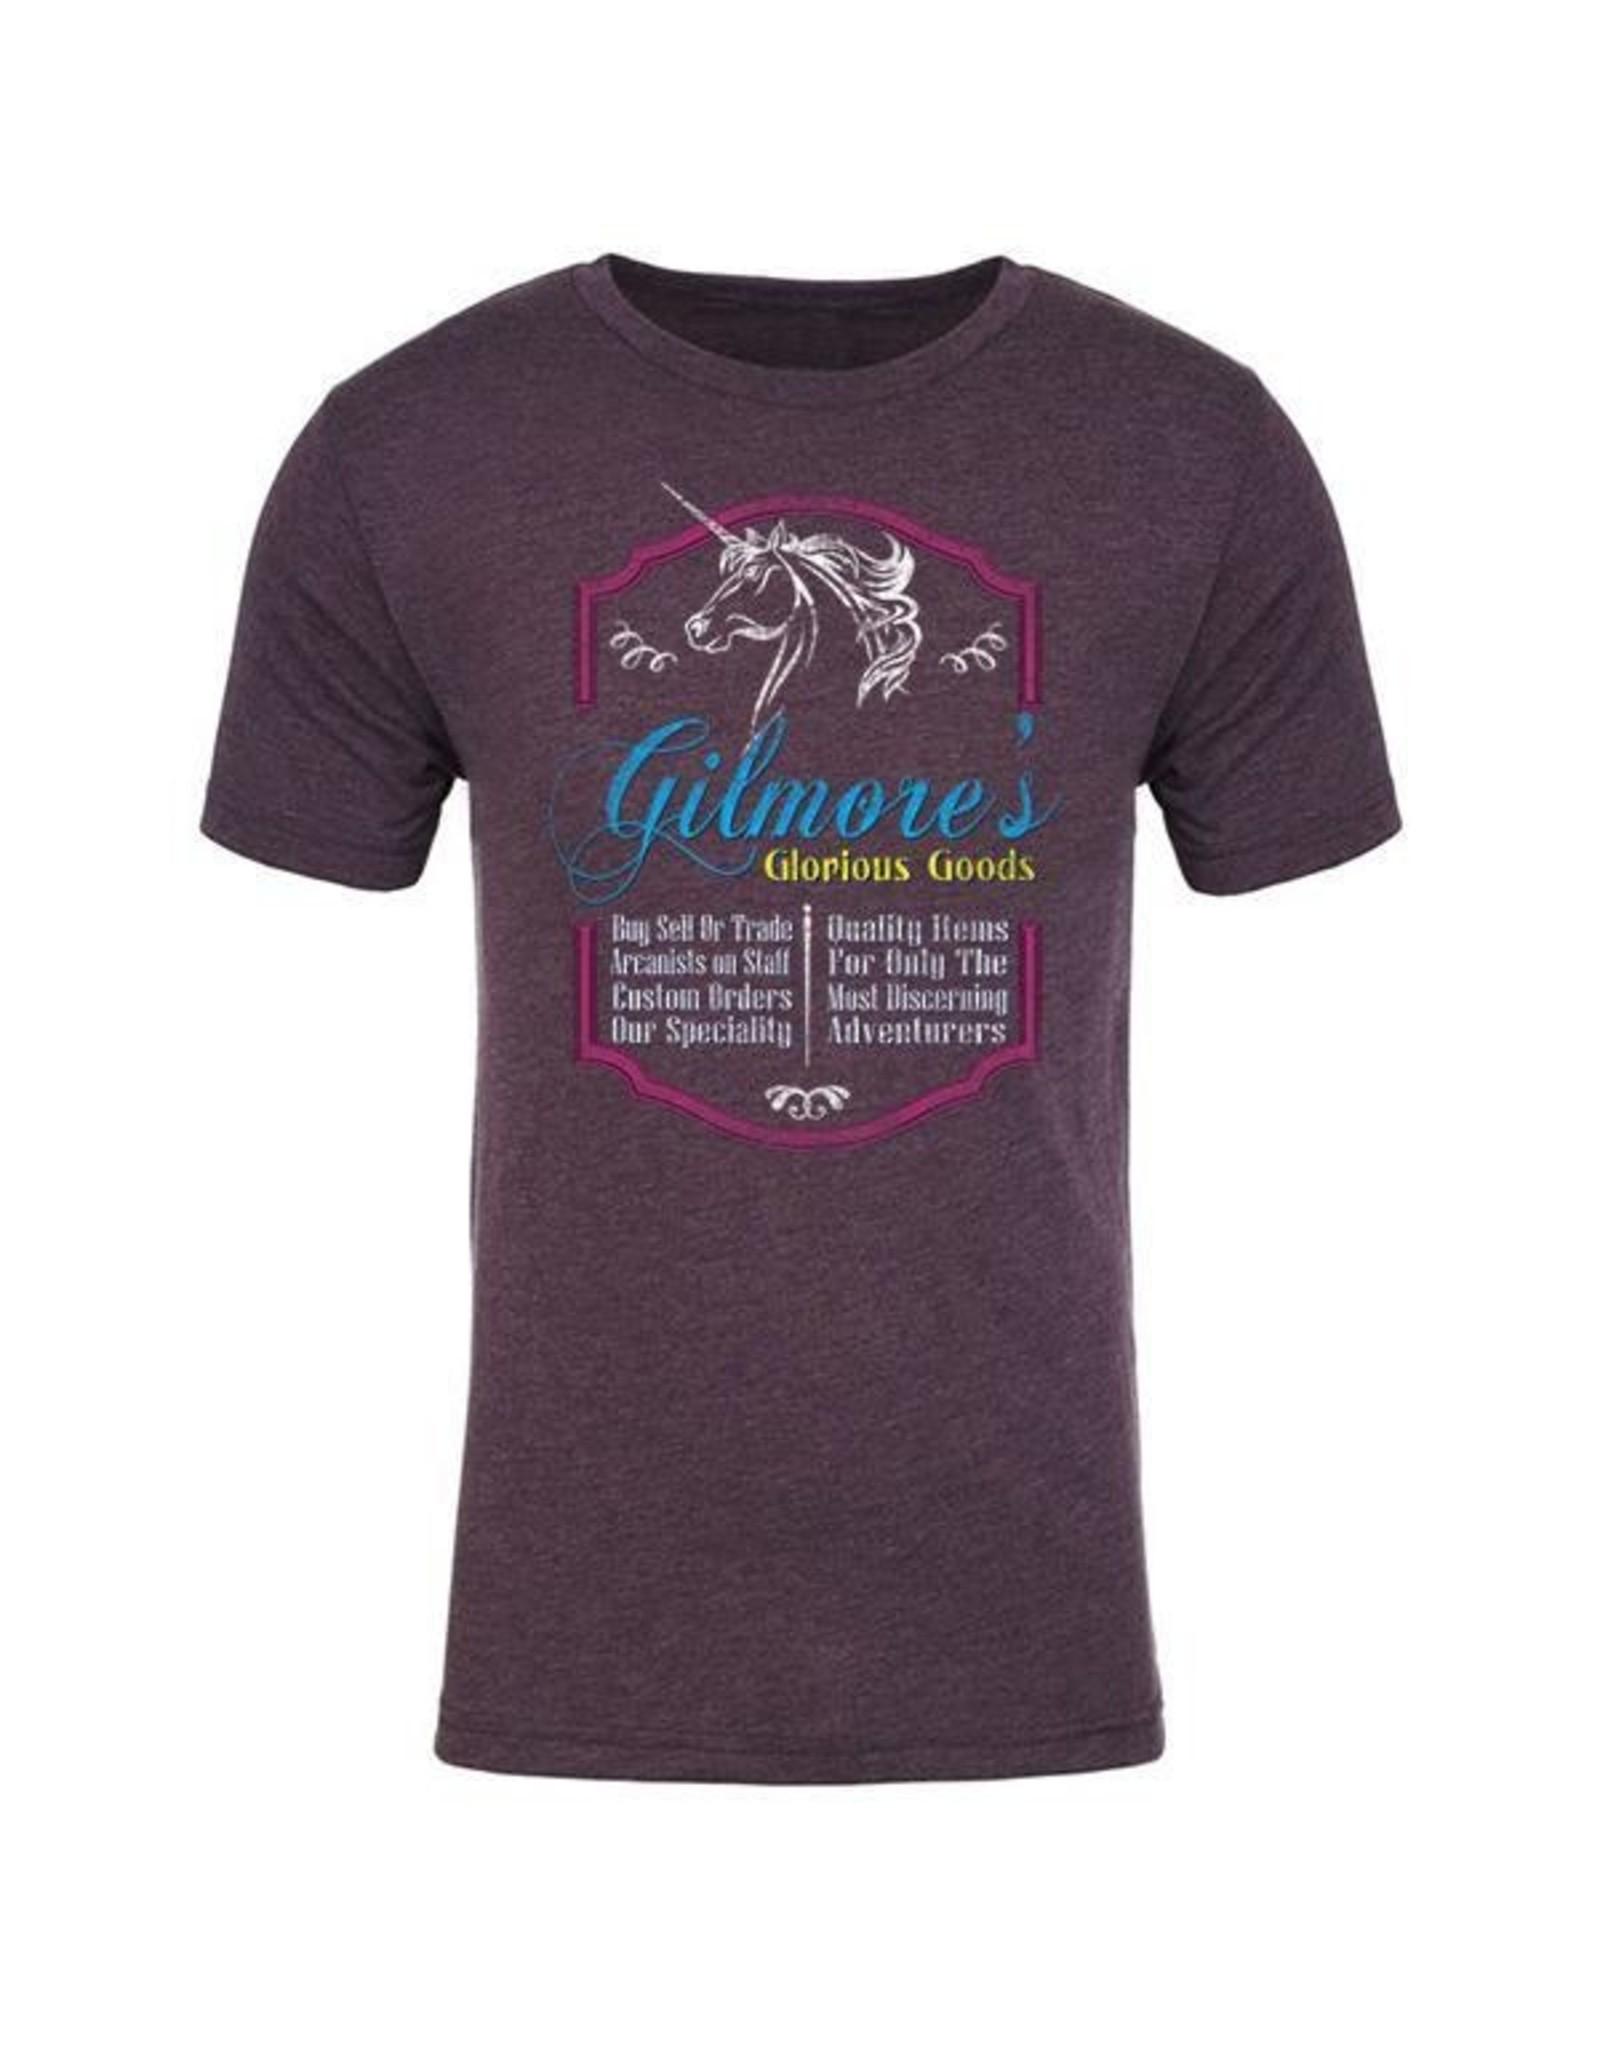 Critical Role Gilmore's Glorious Goods T-Shirt (Medium)